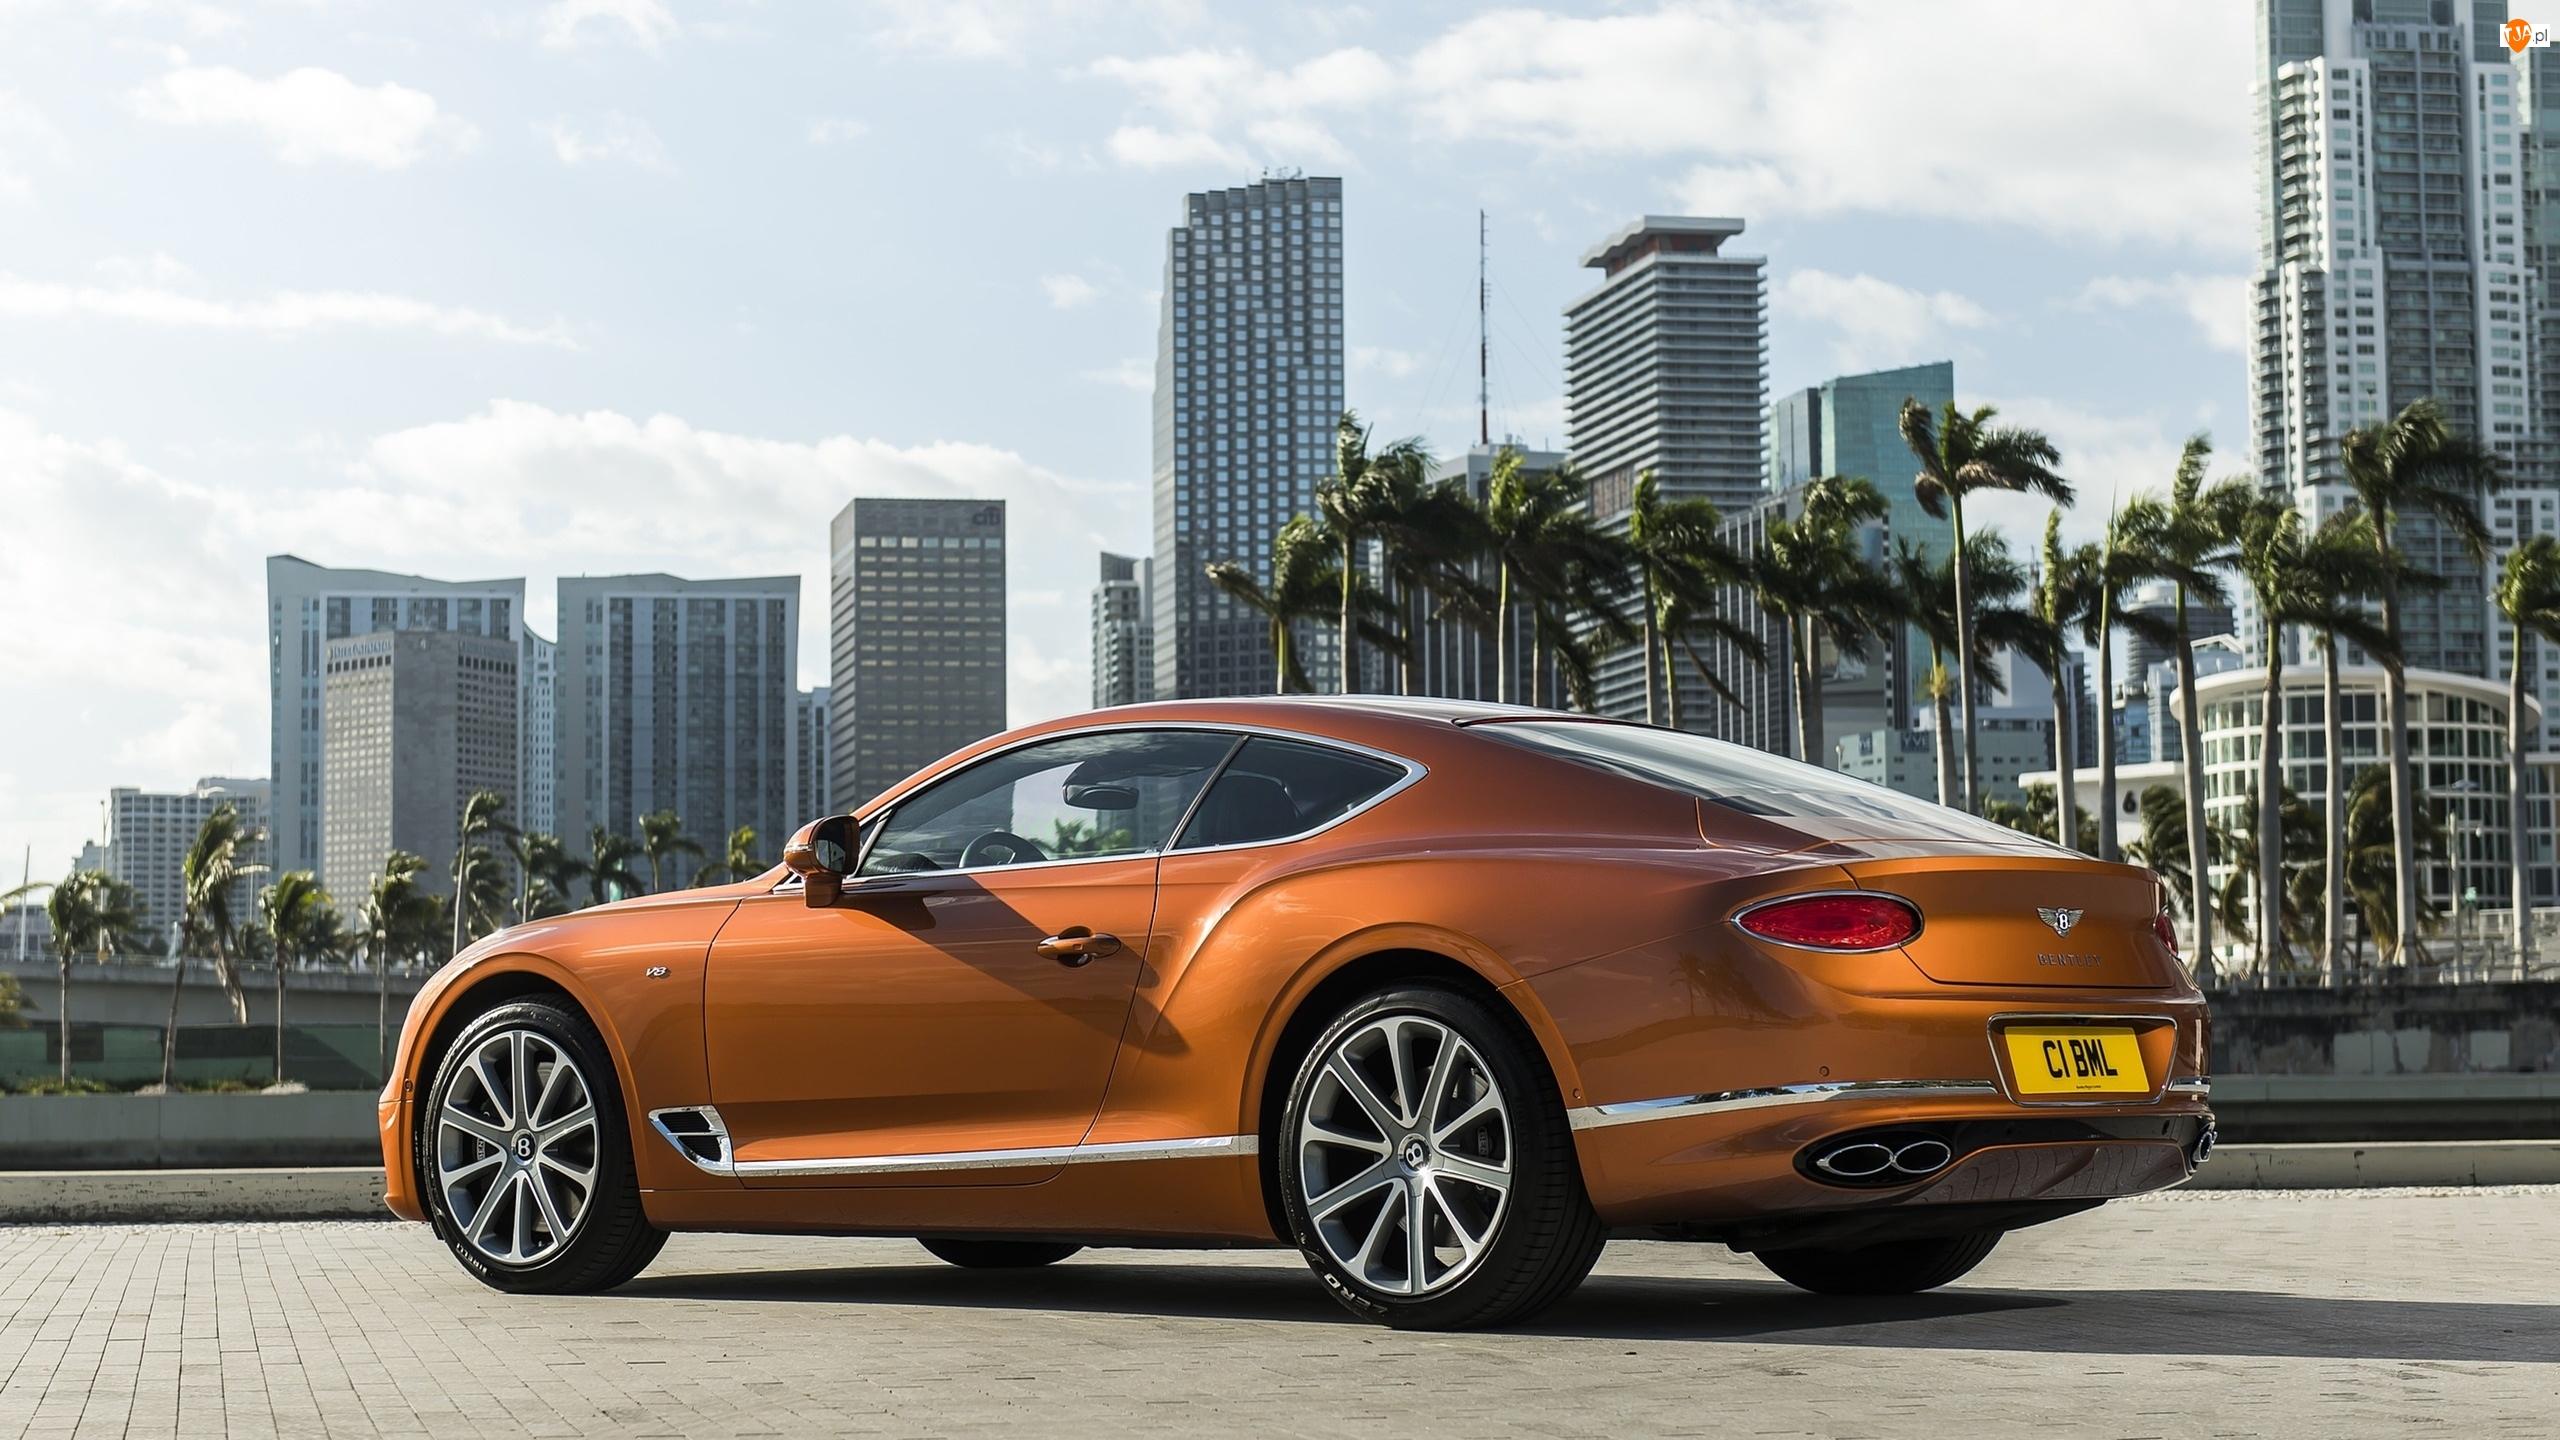 Bok, Bentley Continental GT V8 Coupe